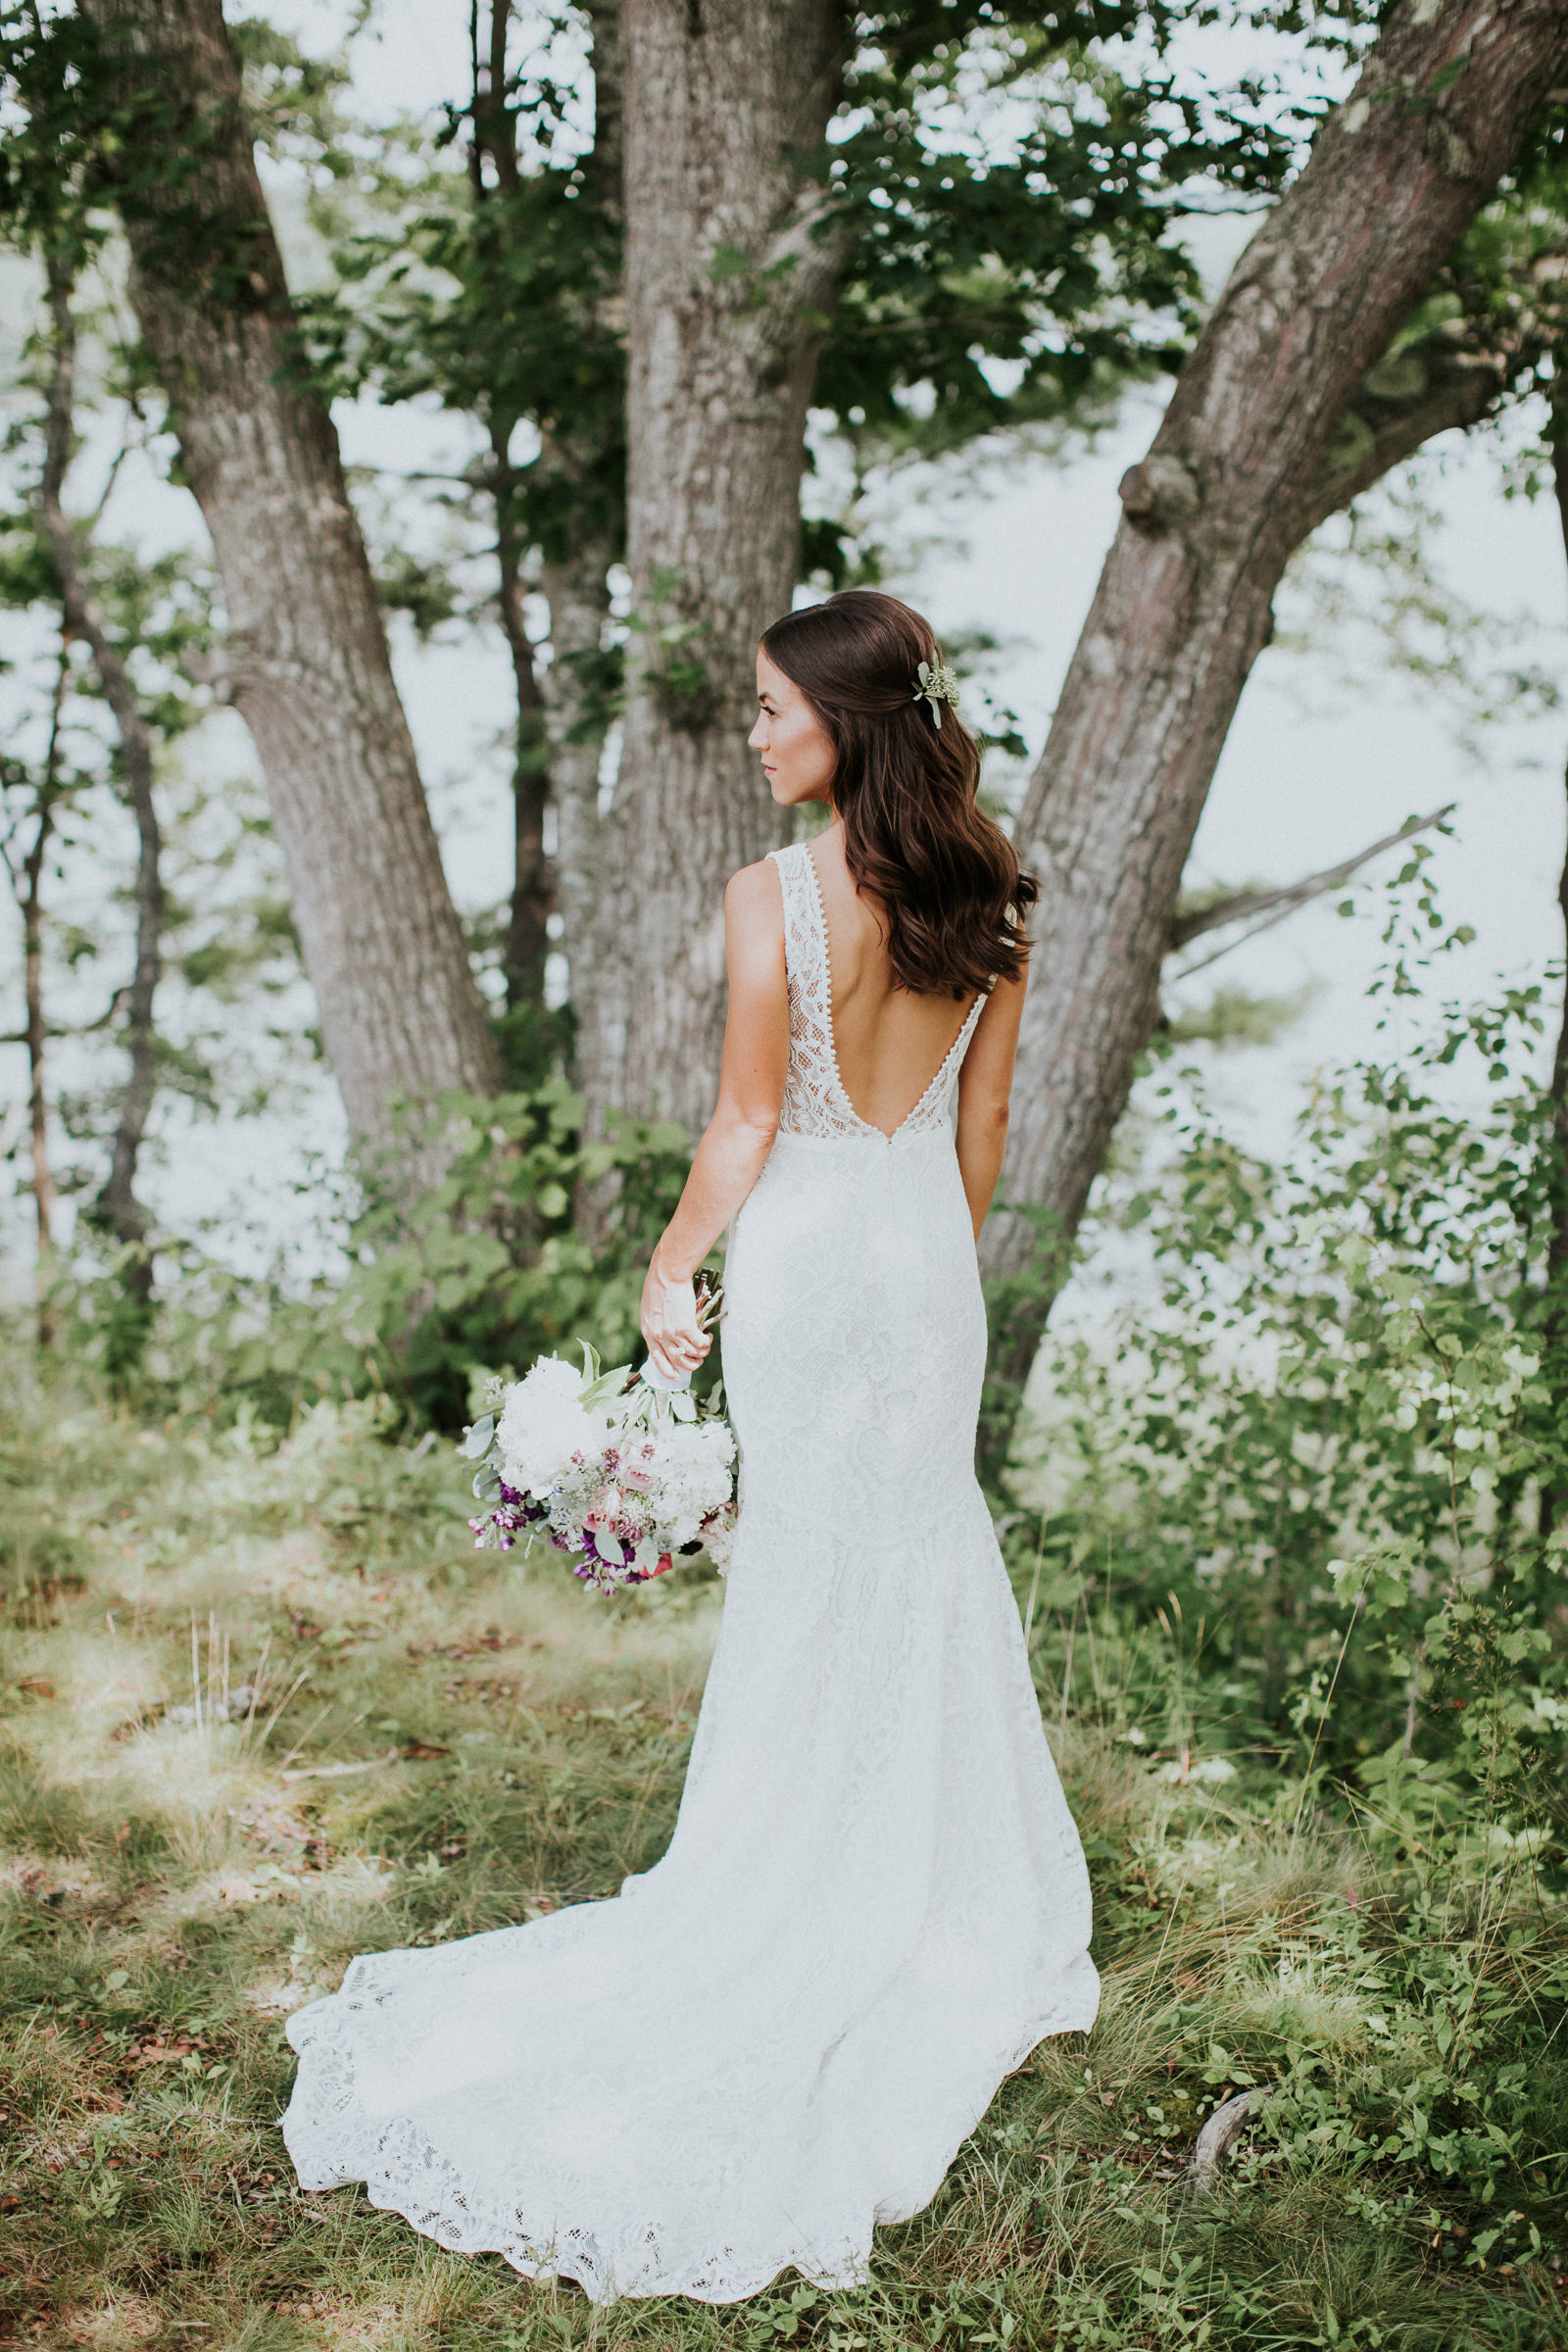 Marianmade-Farm-Wiscasset-Maine-Fine-Art-Documentary-Wedding-Photographer-Elvira-Kalviste-Photography-50.jpg